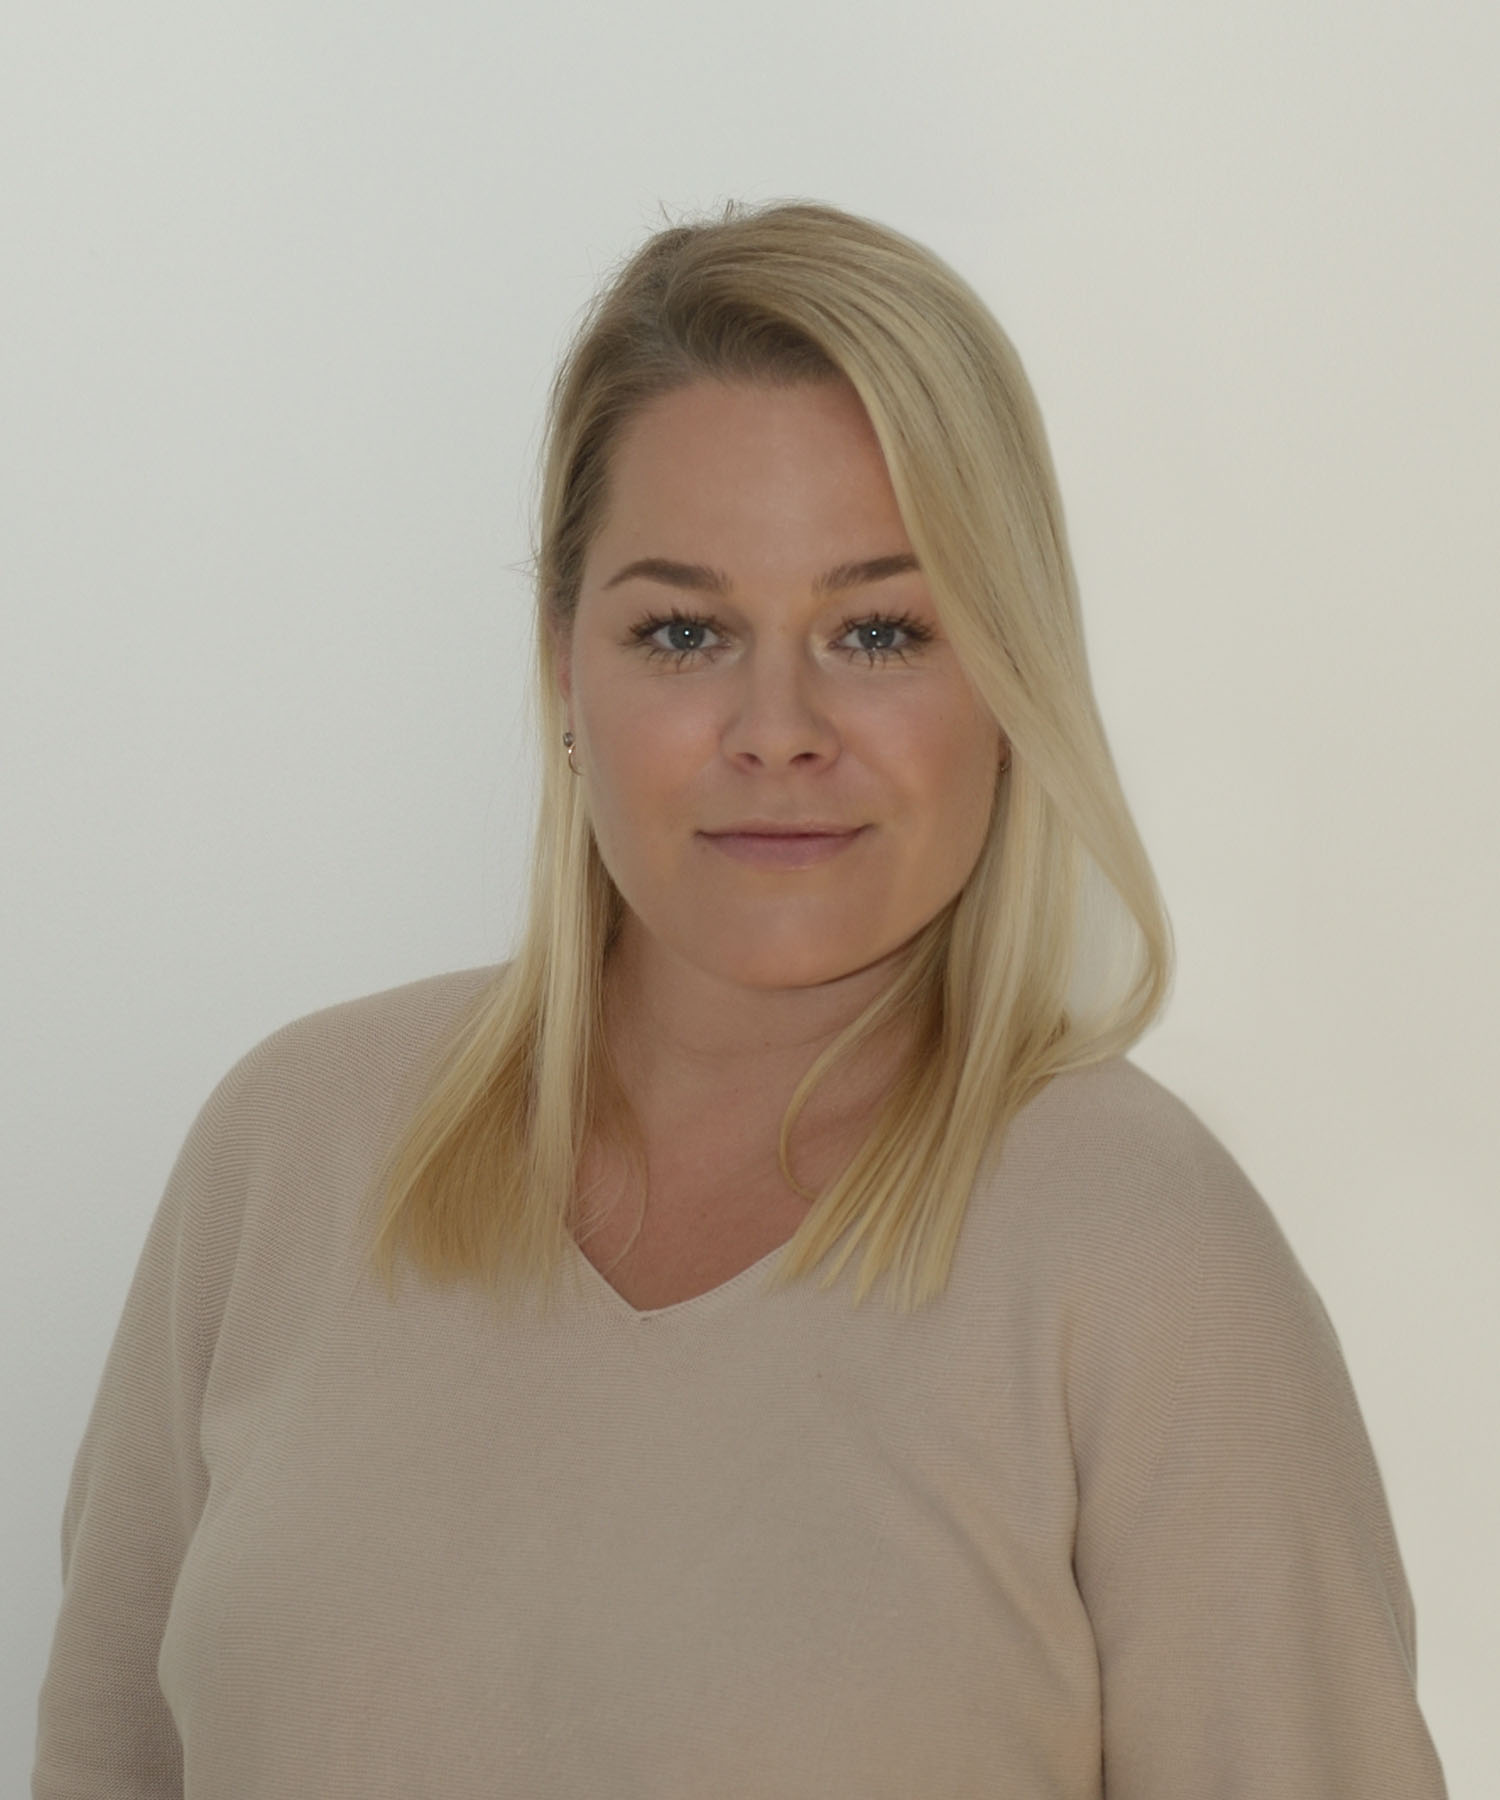 Ingrid Vachtel